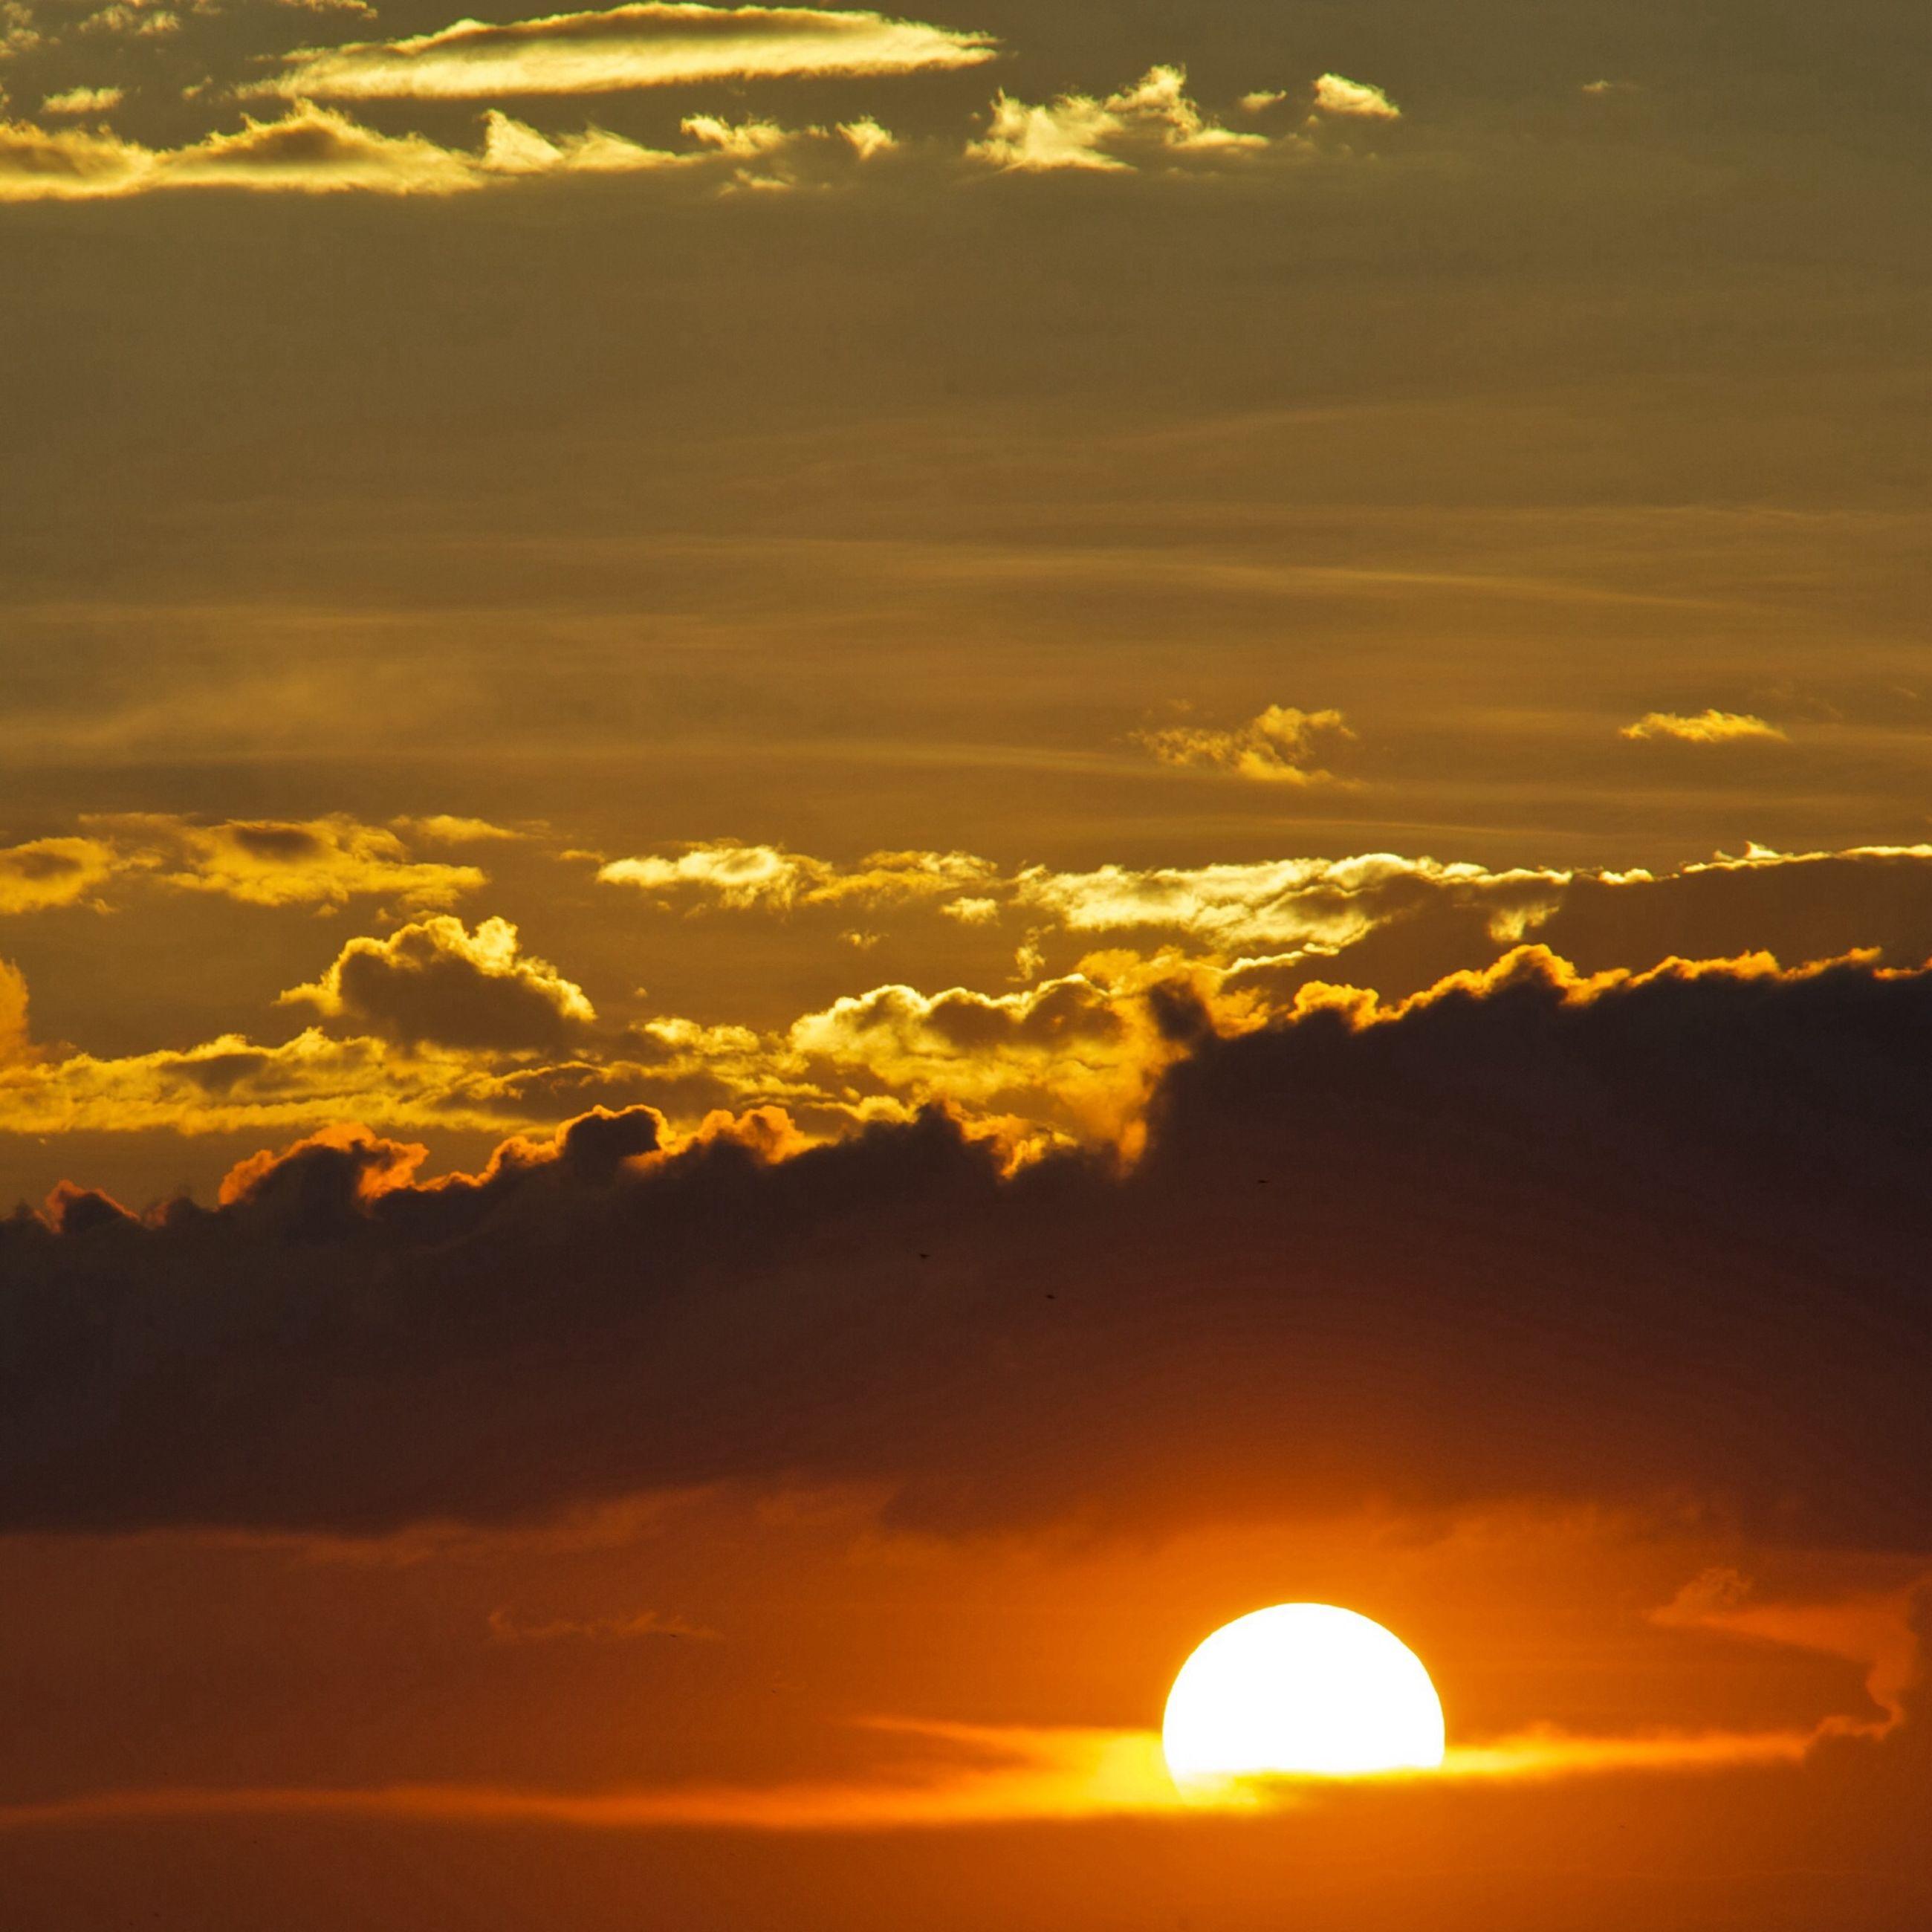 sunset, orange color, scenics, sun, beauty in nature, sky, tranquil scene, tranquility, idyllic, cloud - sky, nature, dramatic sky, majestic, silhouette, cloud, sunlight, cloudscape, moody sky, atmospheric mood, outdoors